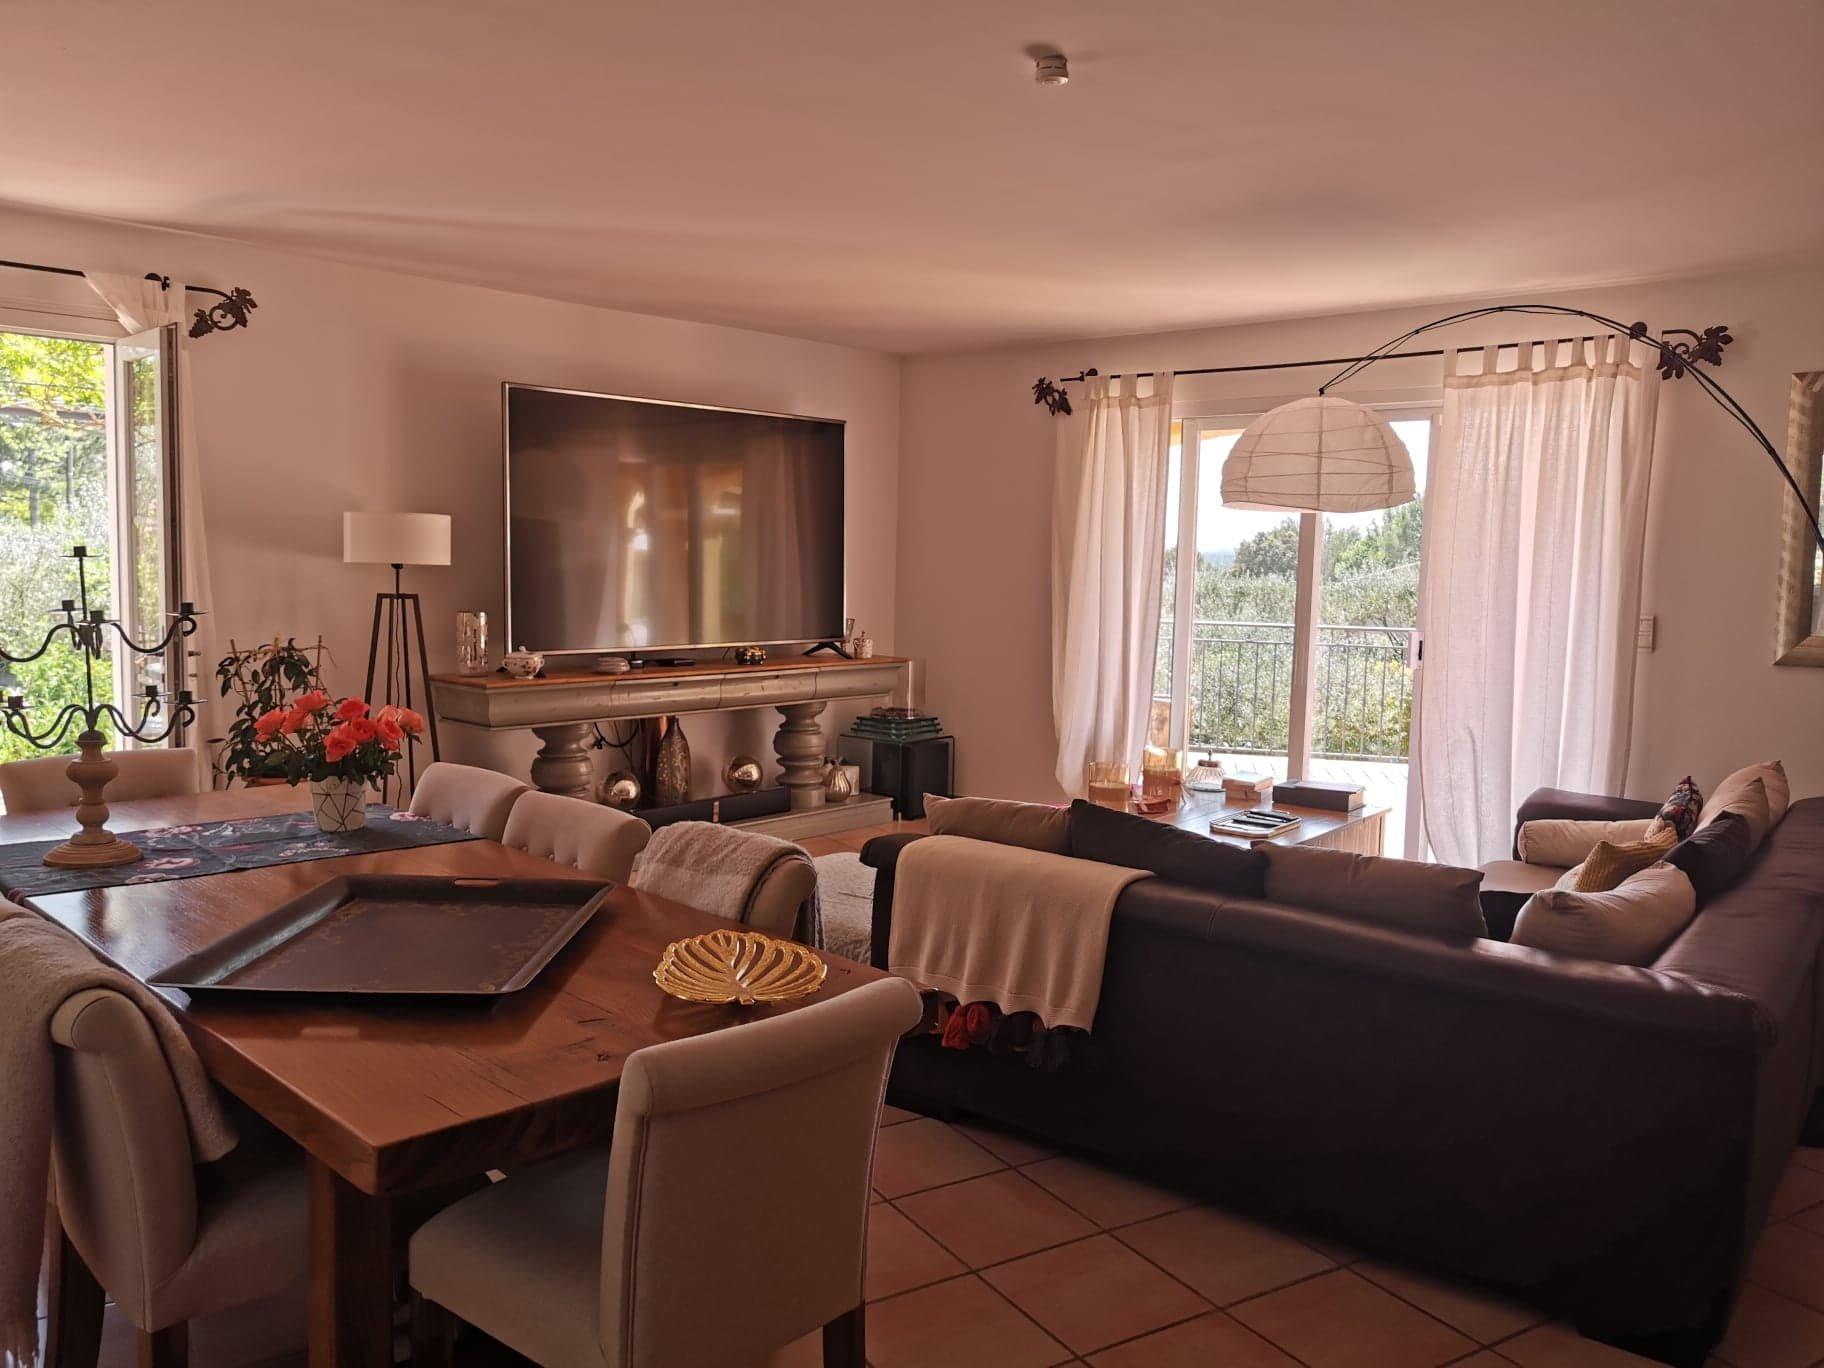 St Antonin, très jolie villa vue dominante+ piscine